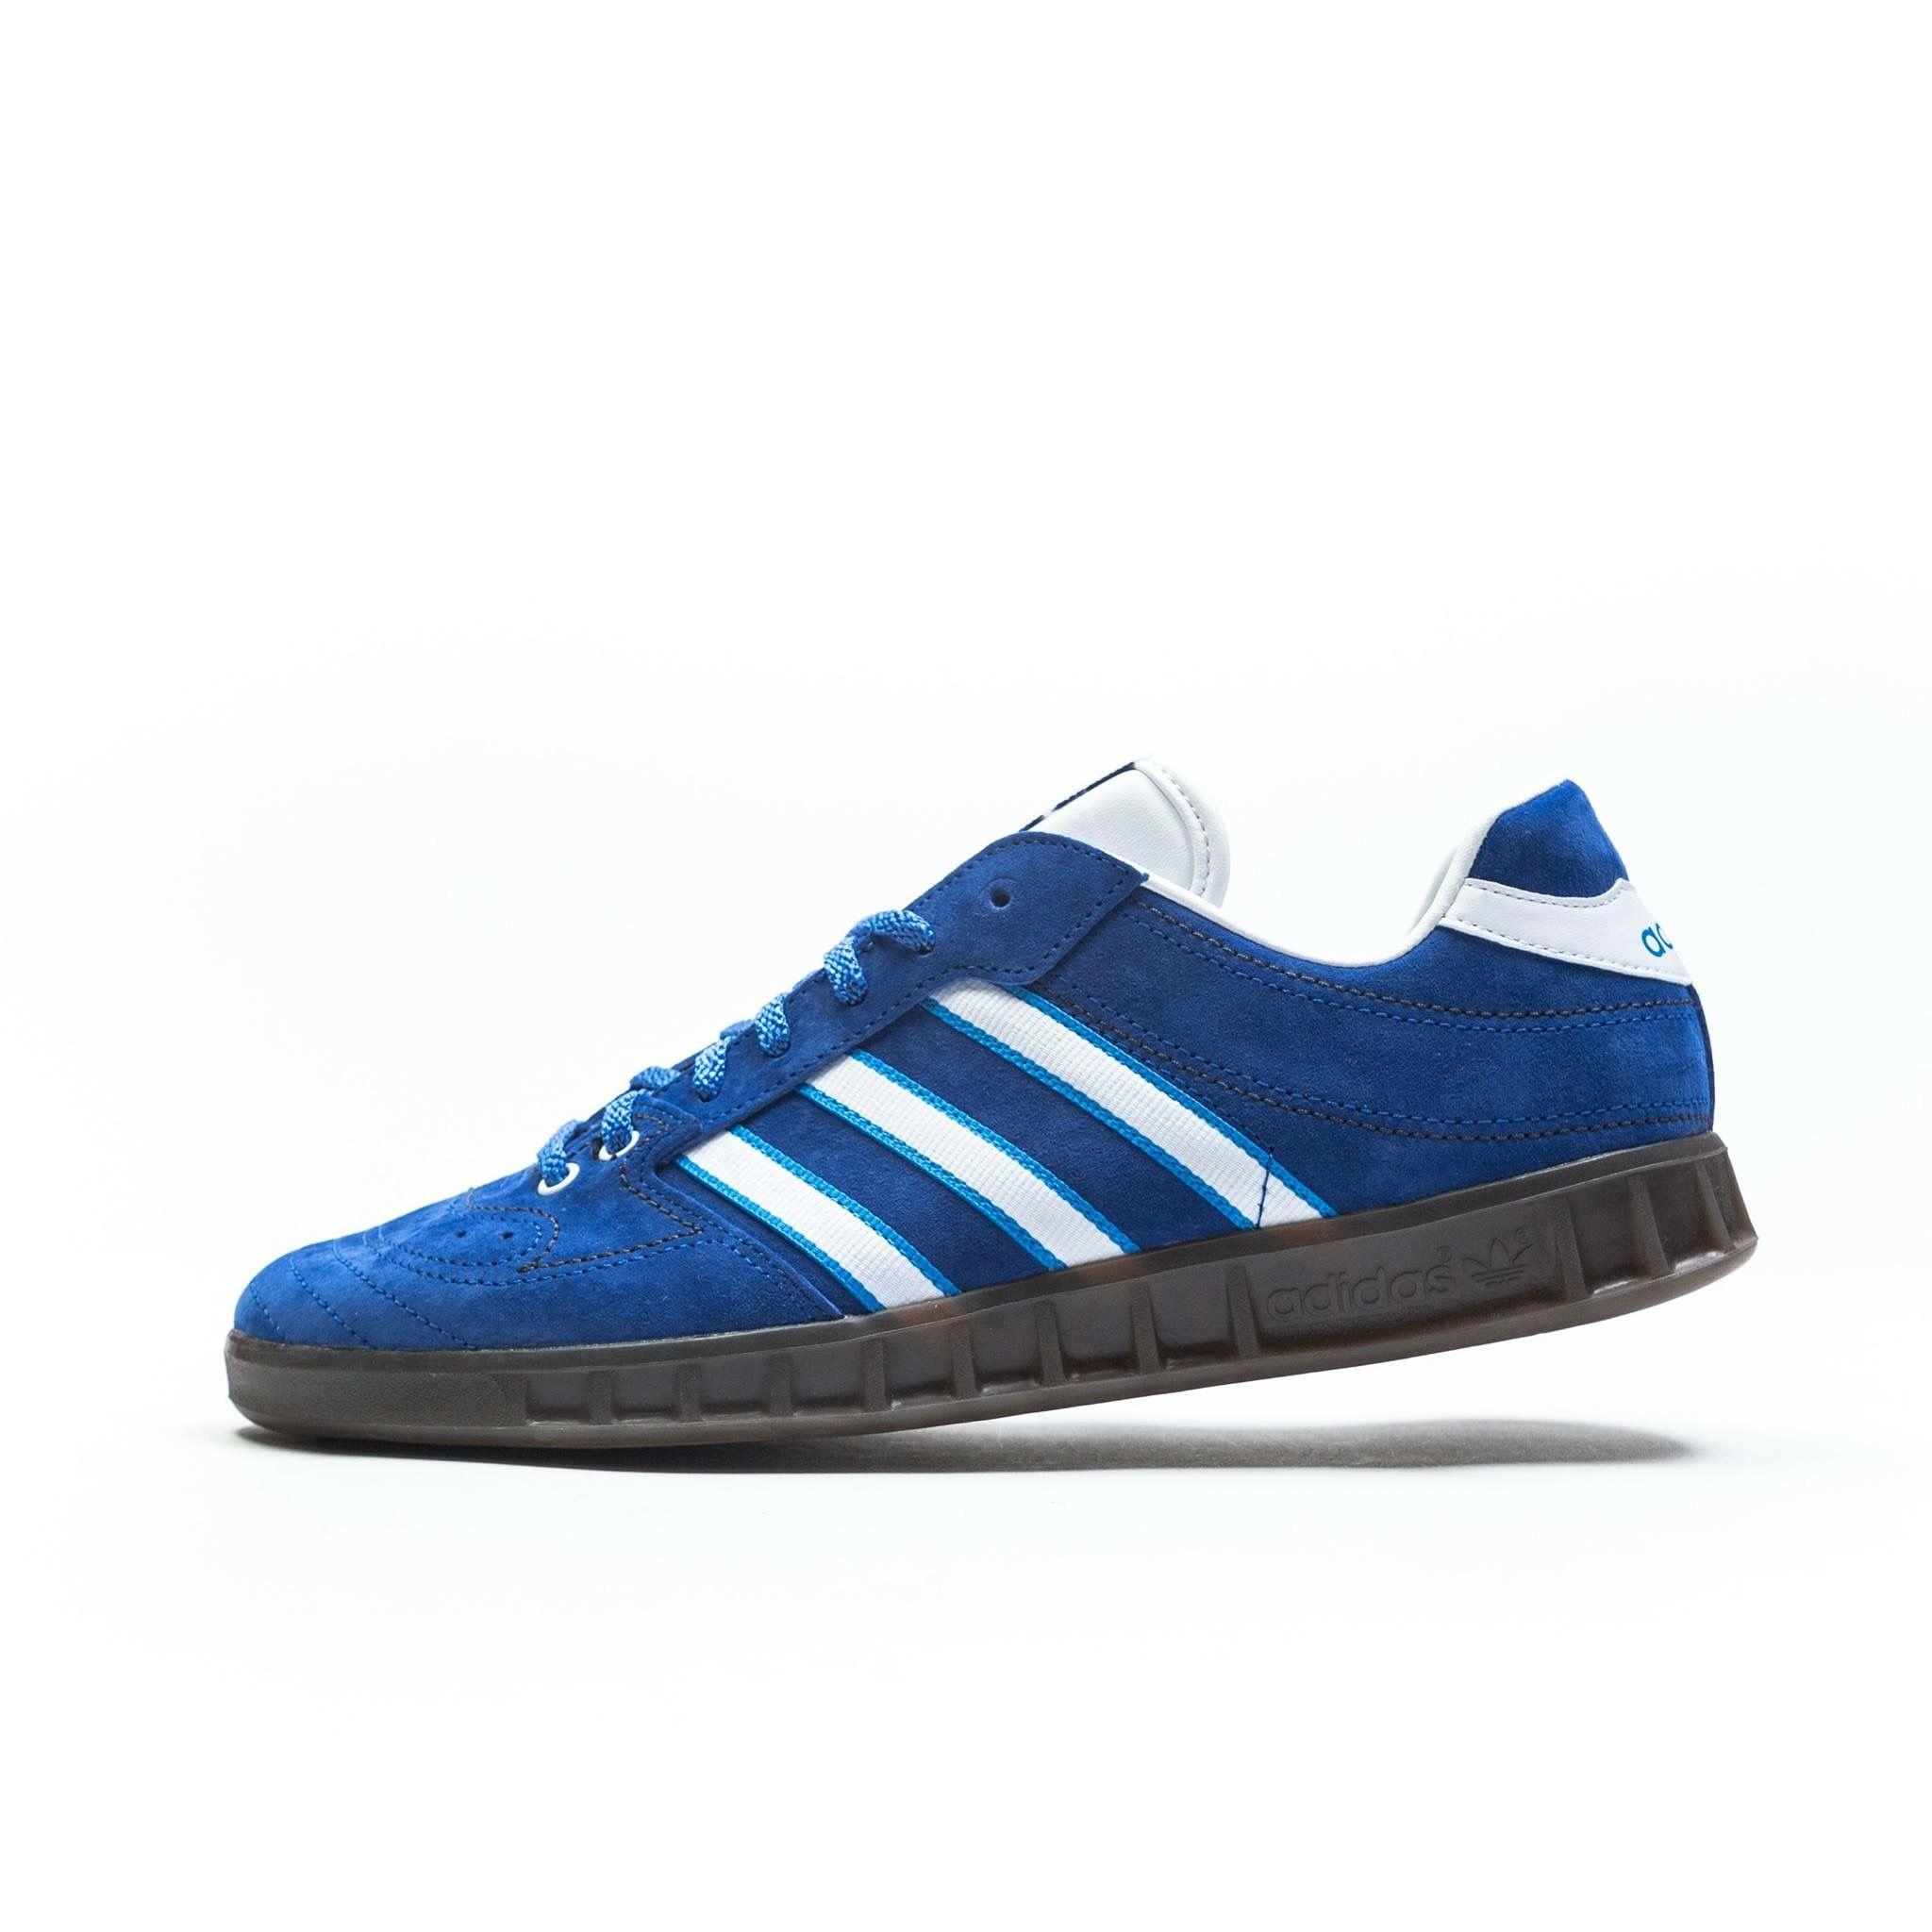 Handball Kreft Spezial Leather-trimmed Suede Sneakers - Royal blueadidas Originals eI9Nr3